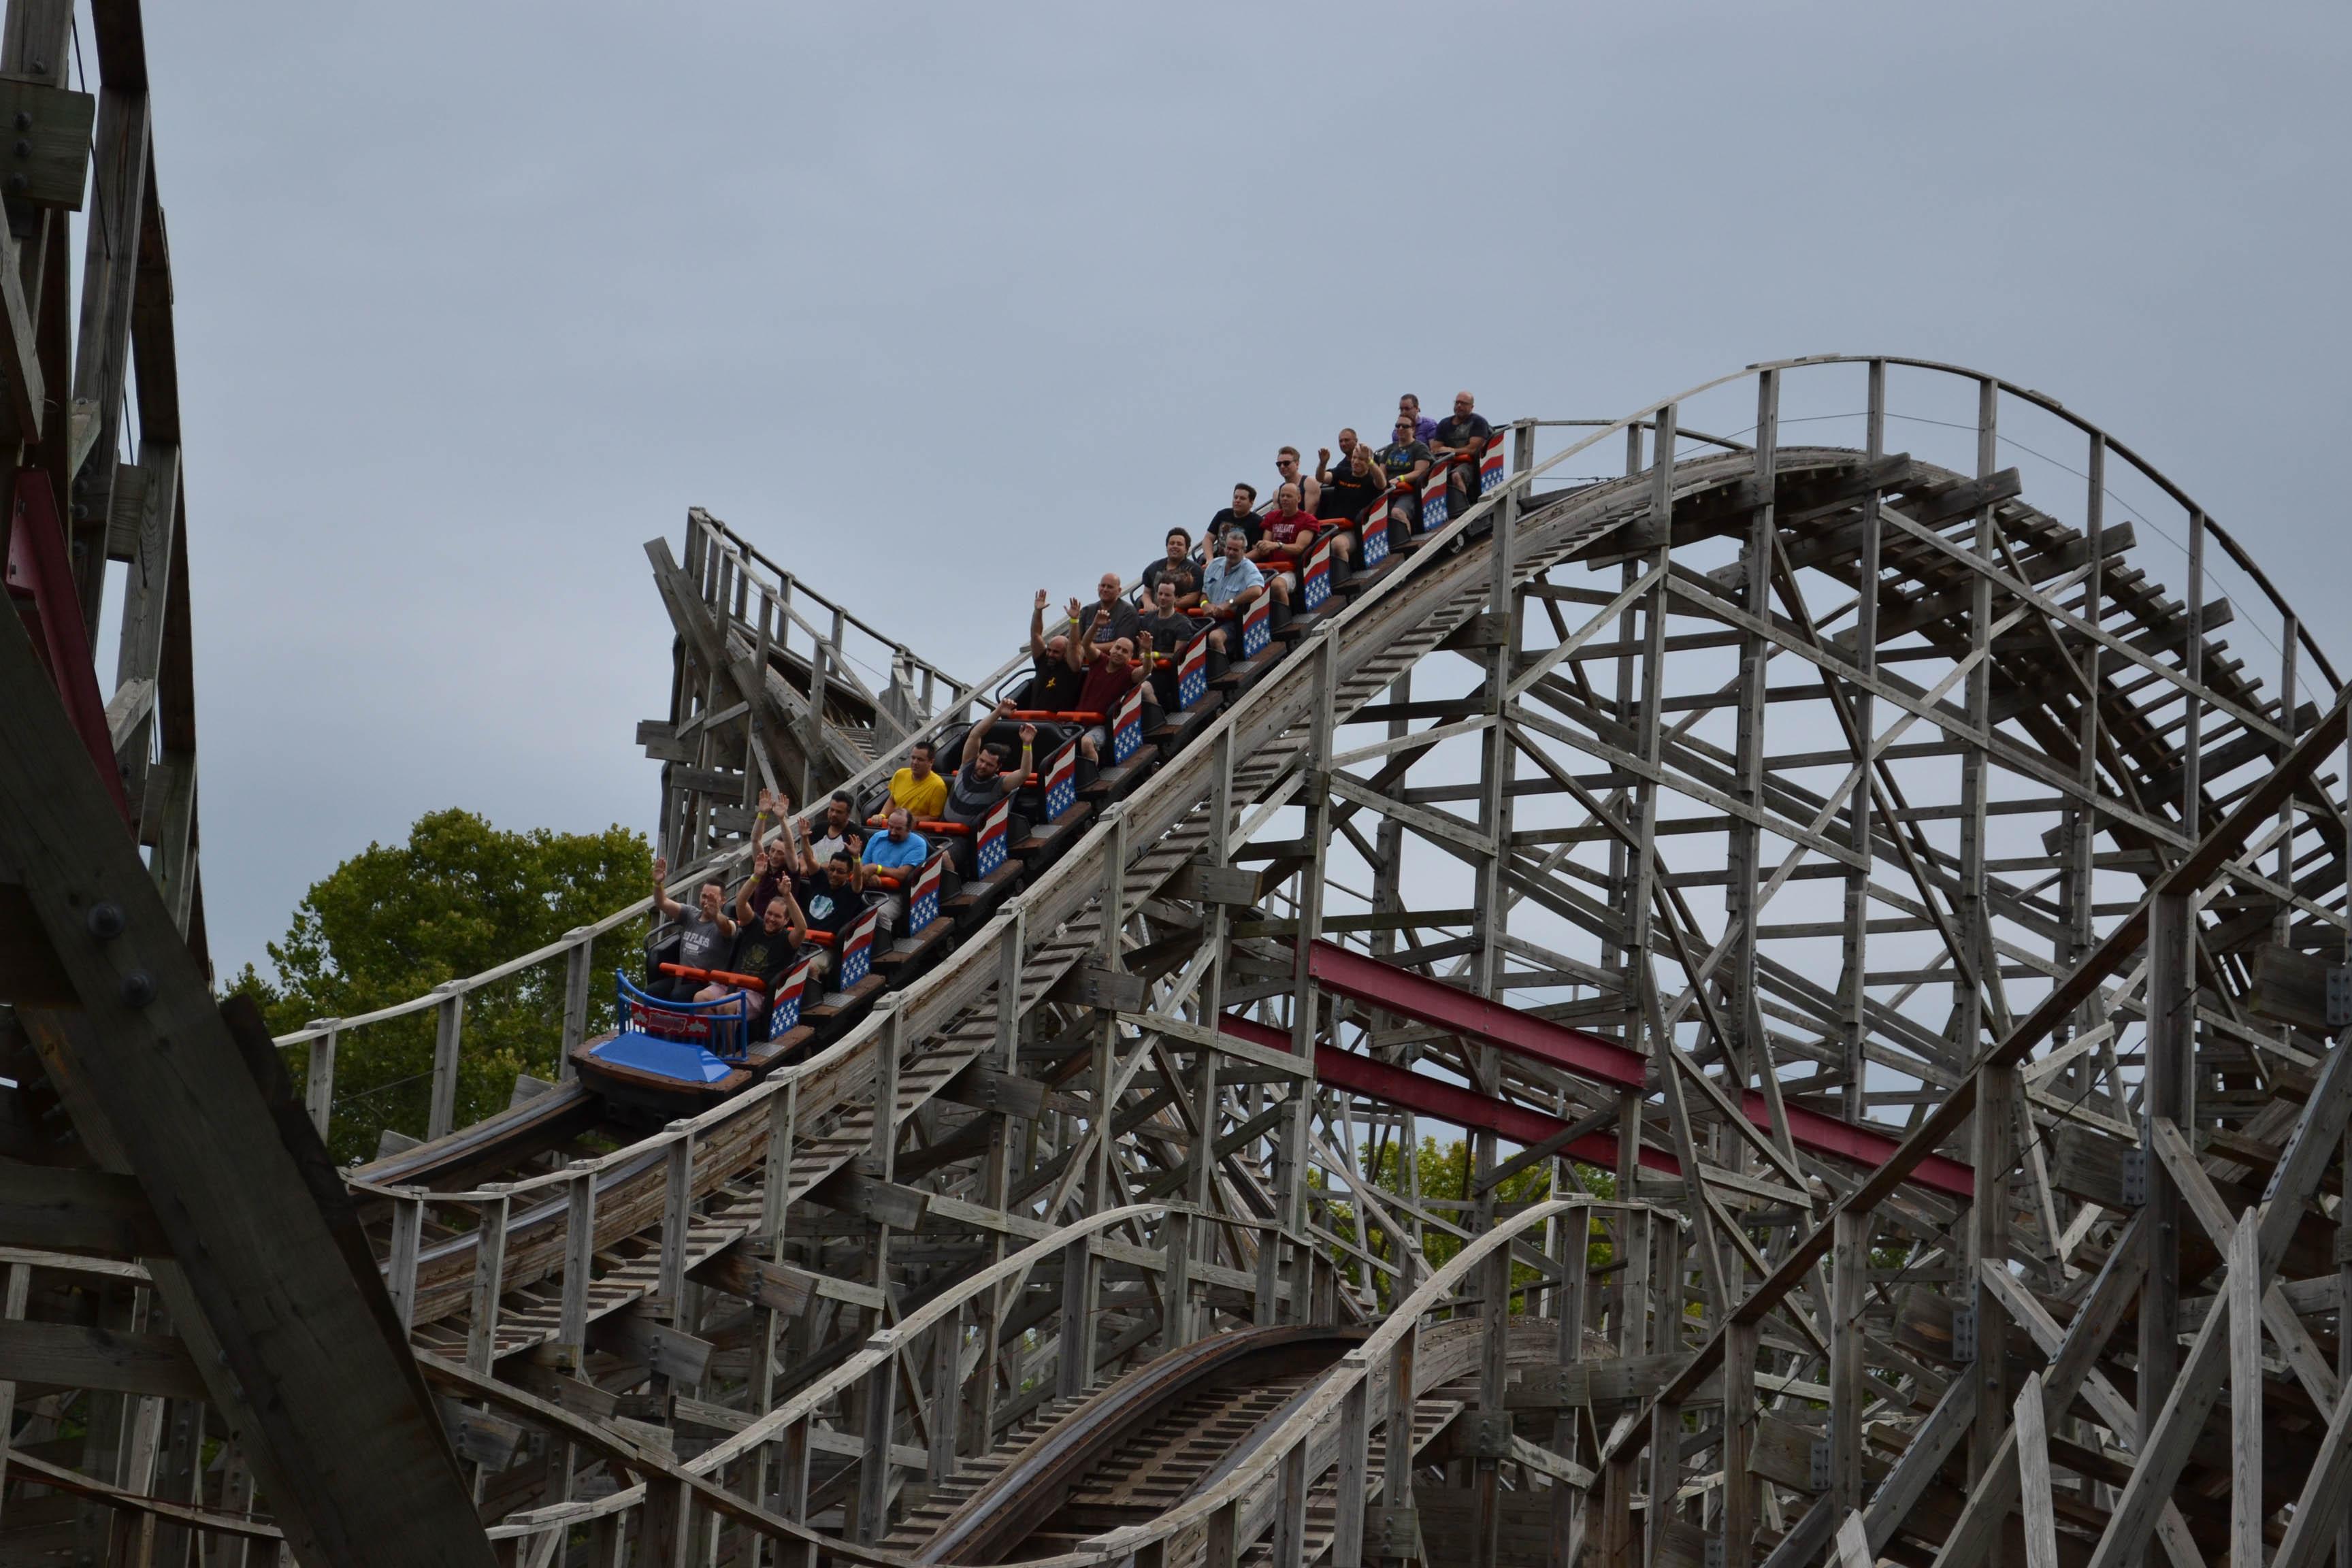 Six Flags St. Louis - Photos, Videos, Reviews, Information